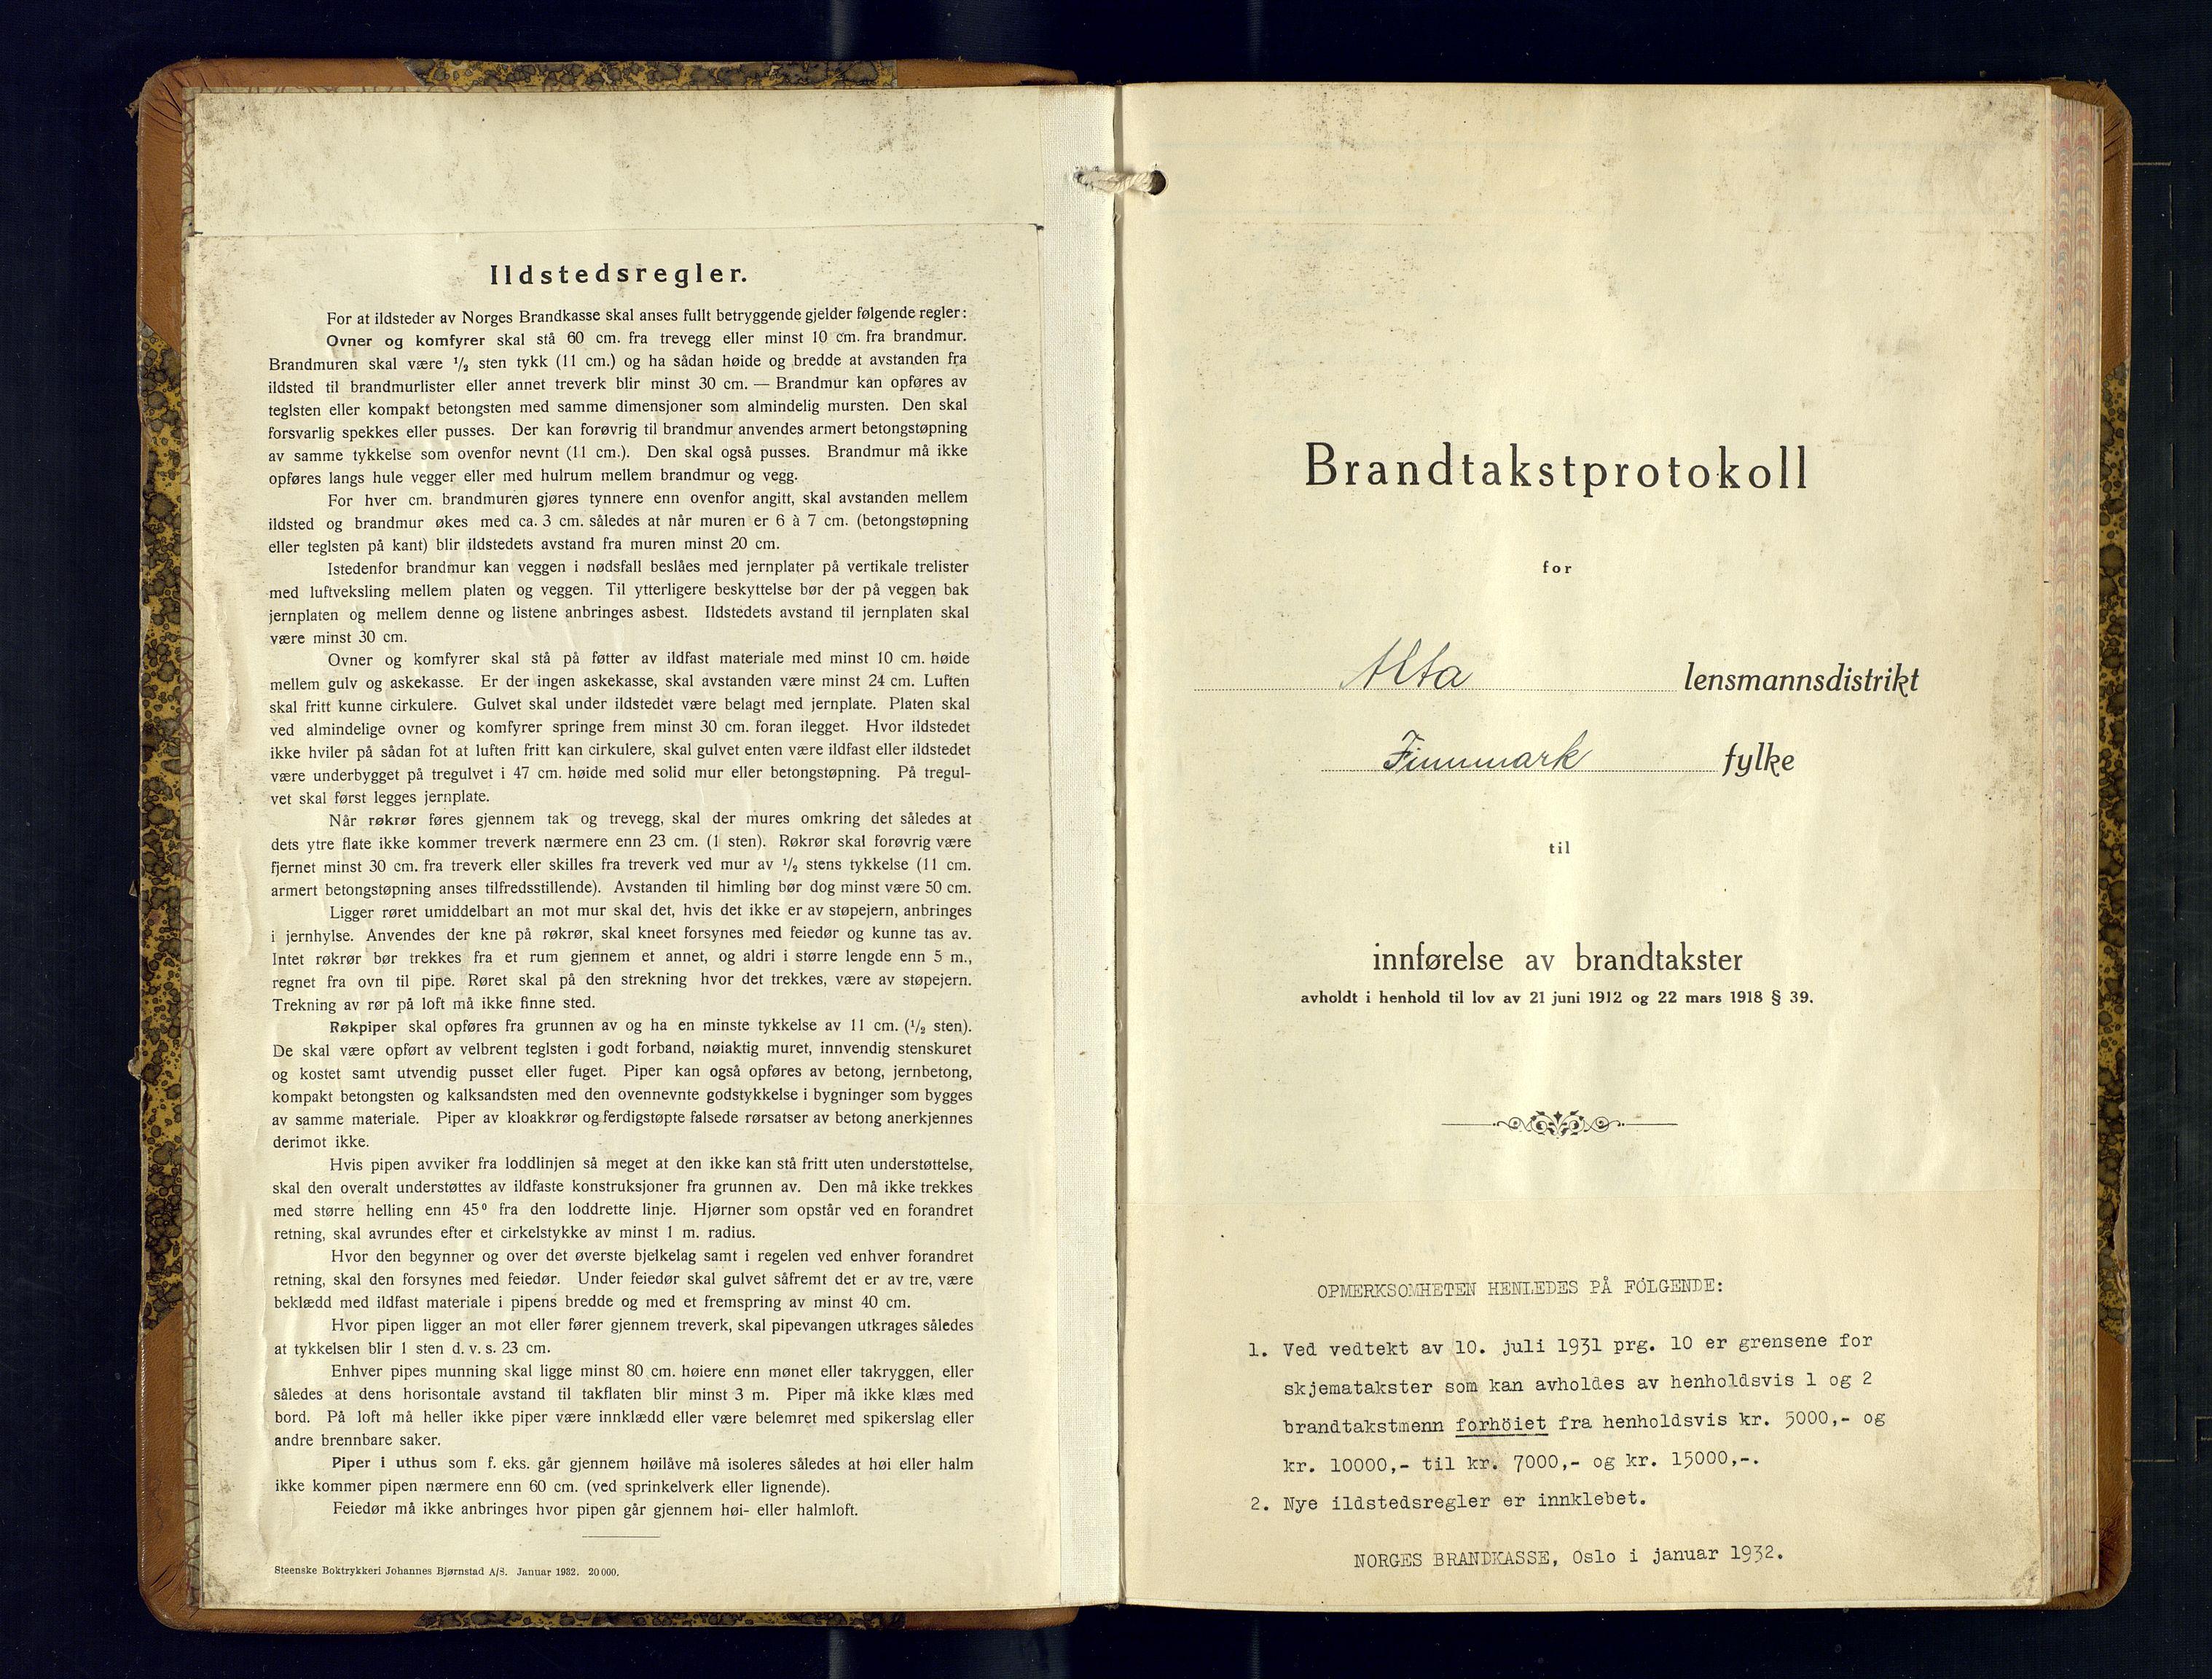 SATØ, Lensmannen i Alta, O/Ob/L0177: Branntakstprotokoll, 1932-1937